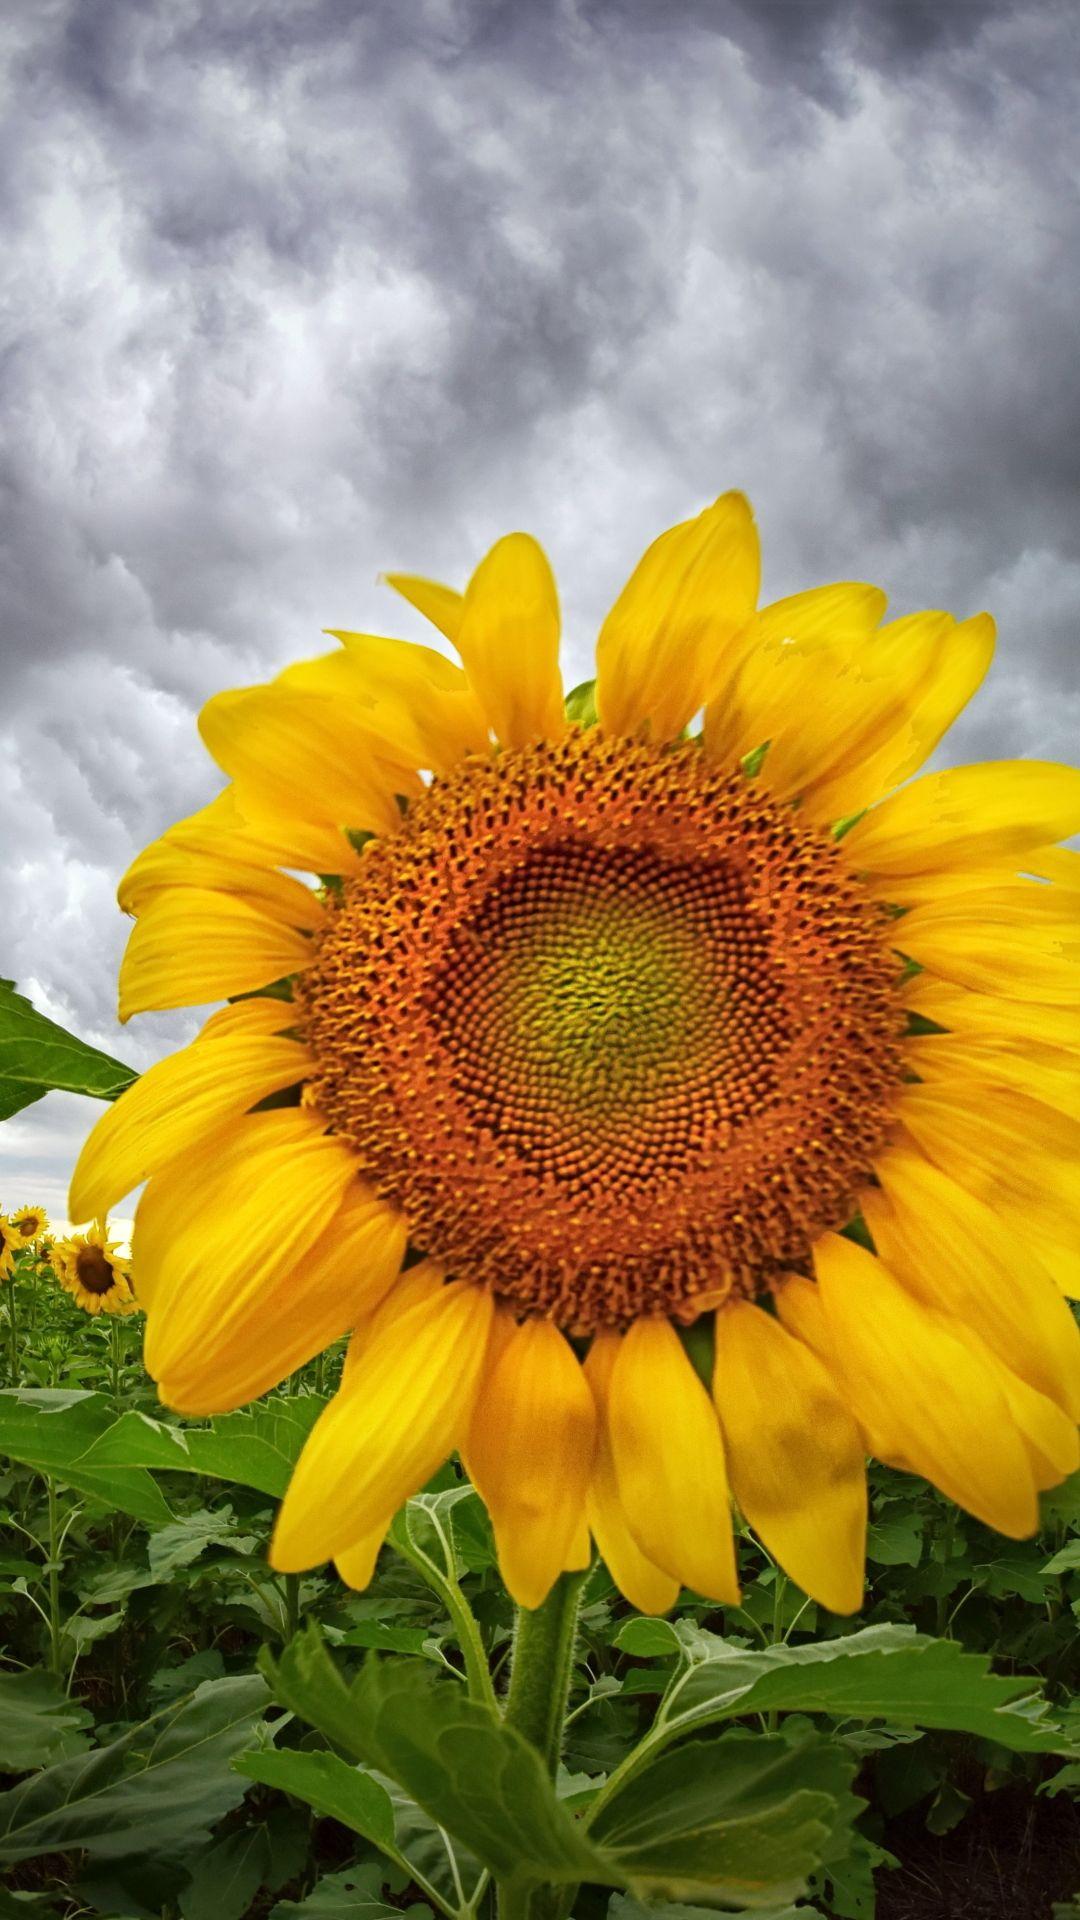 Earth sunflower flowers flower nature yellow flower